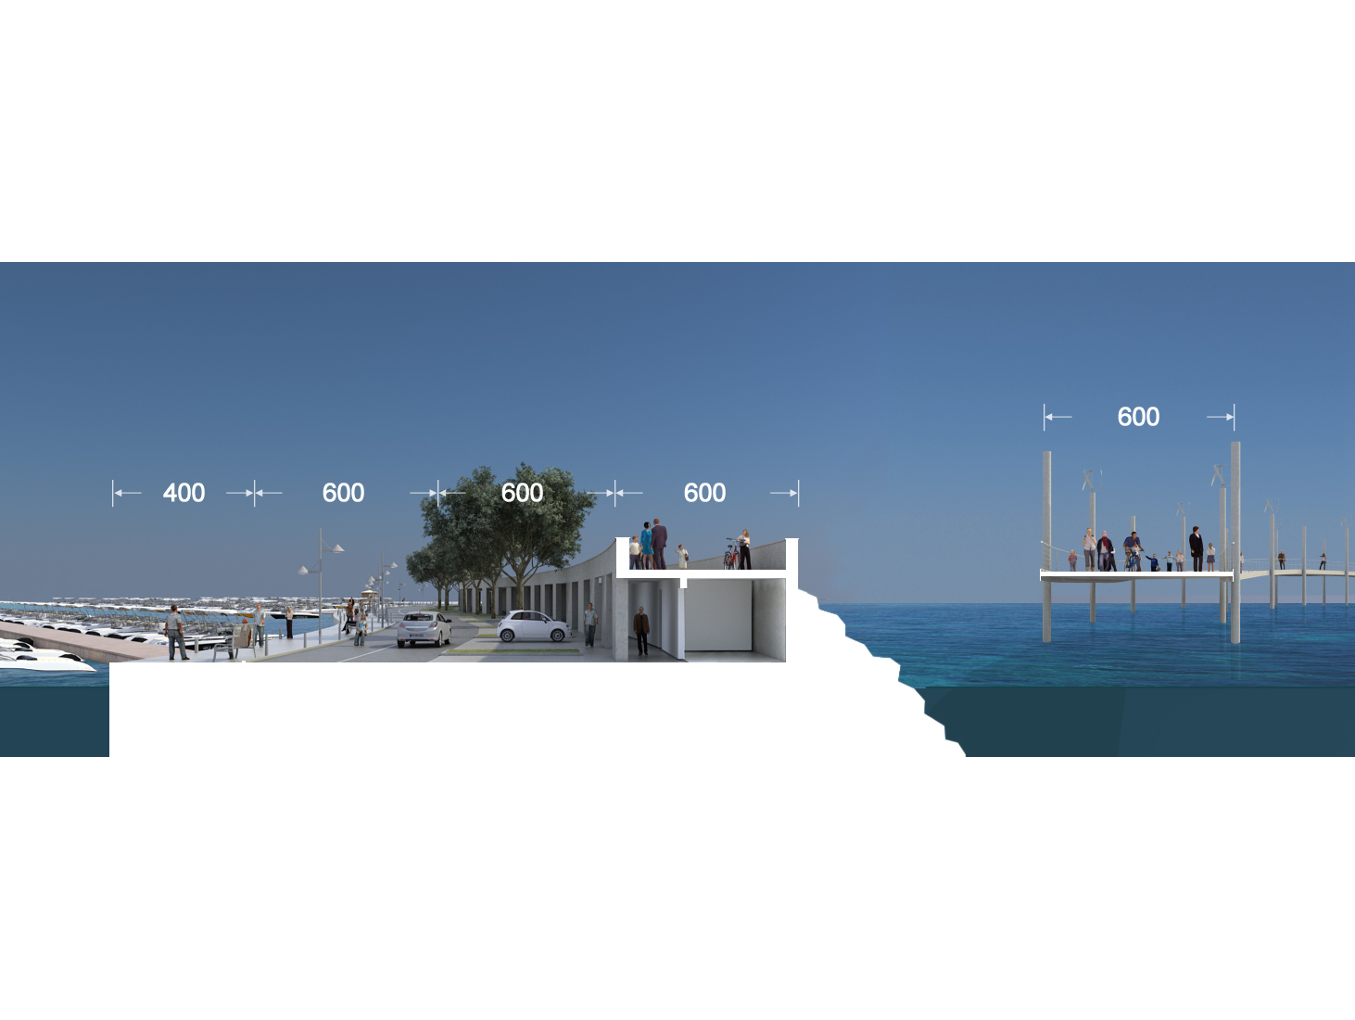 Architettura & Edilizia